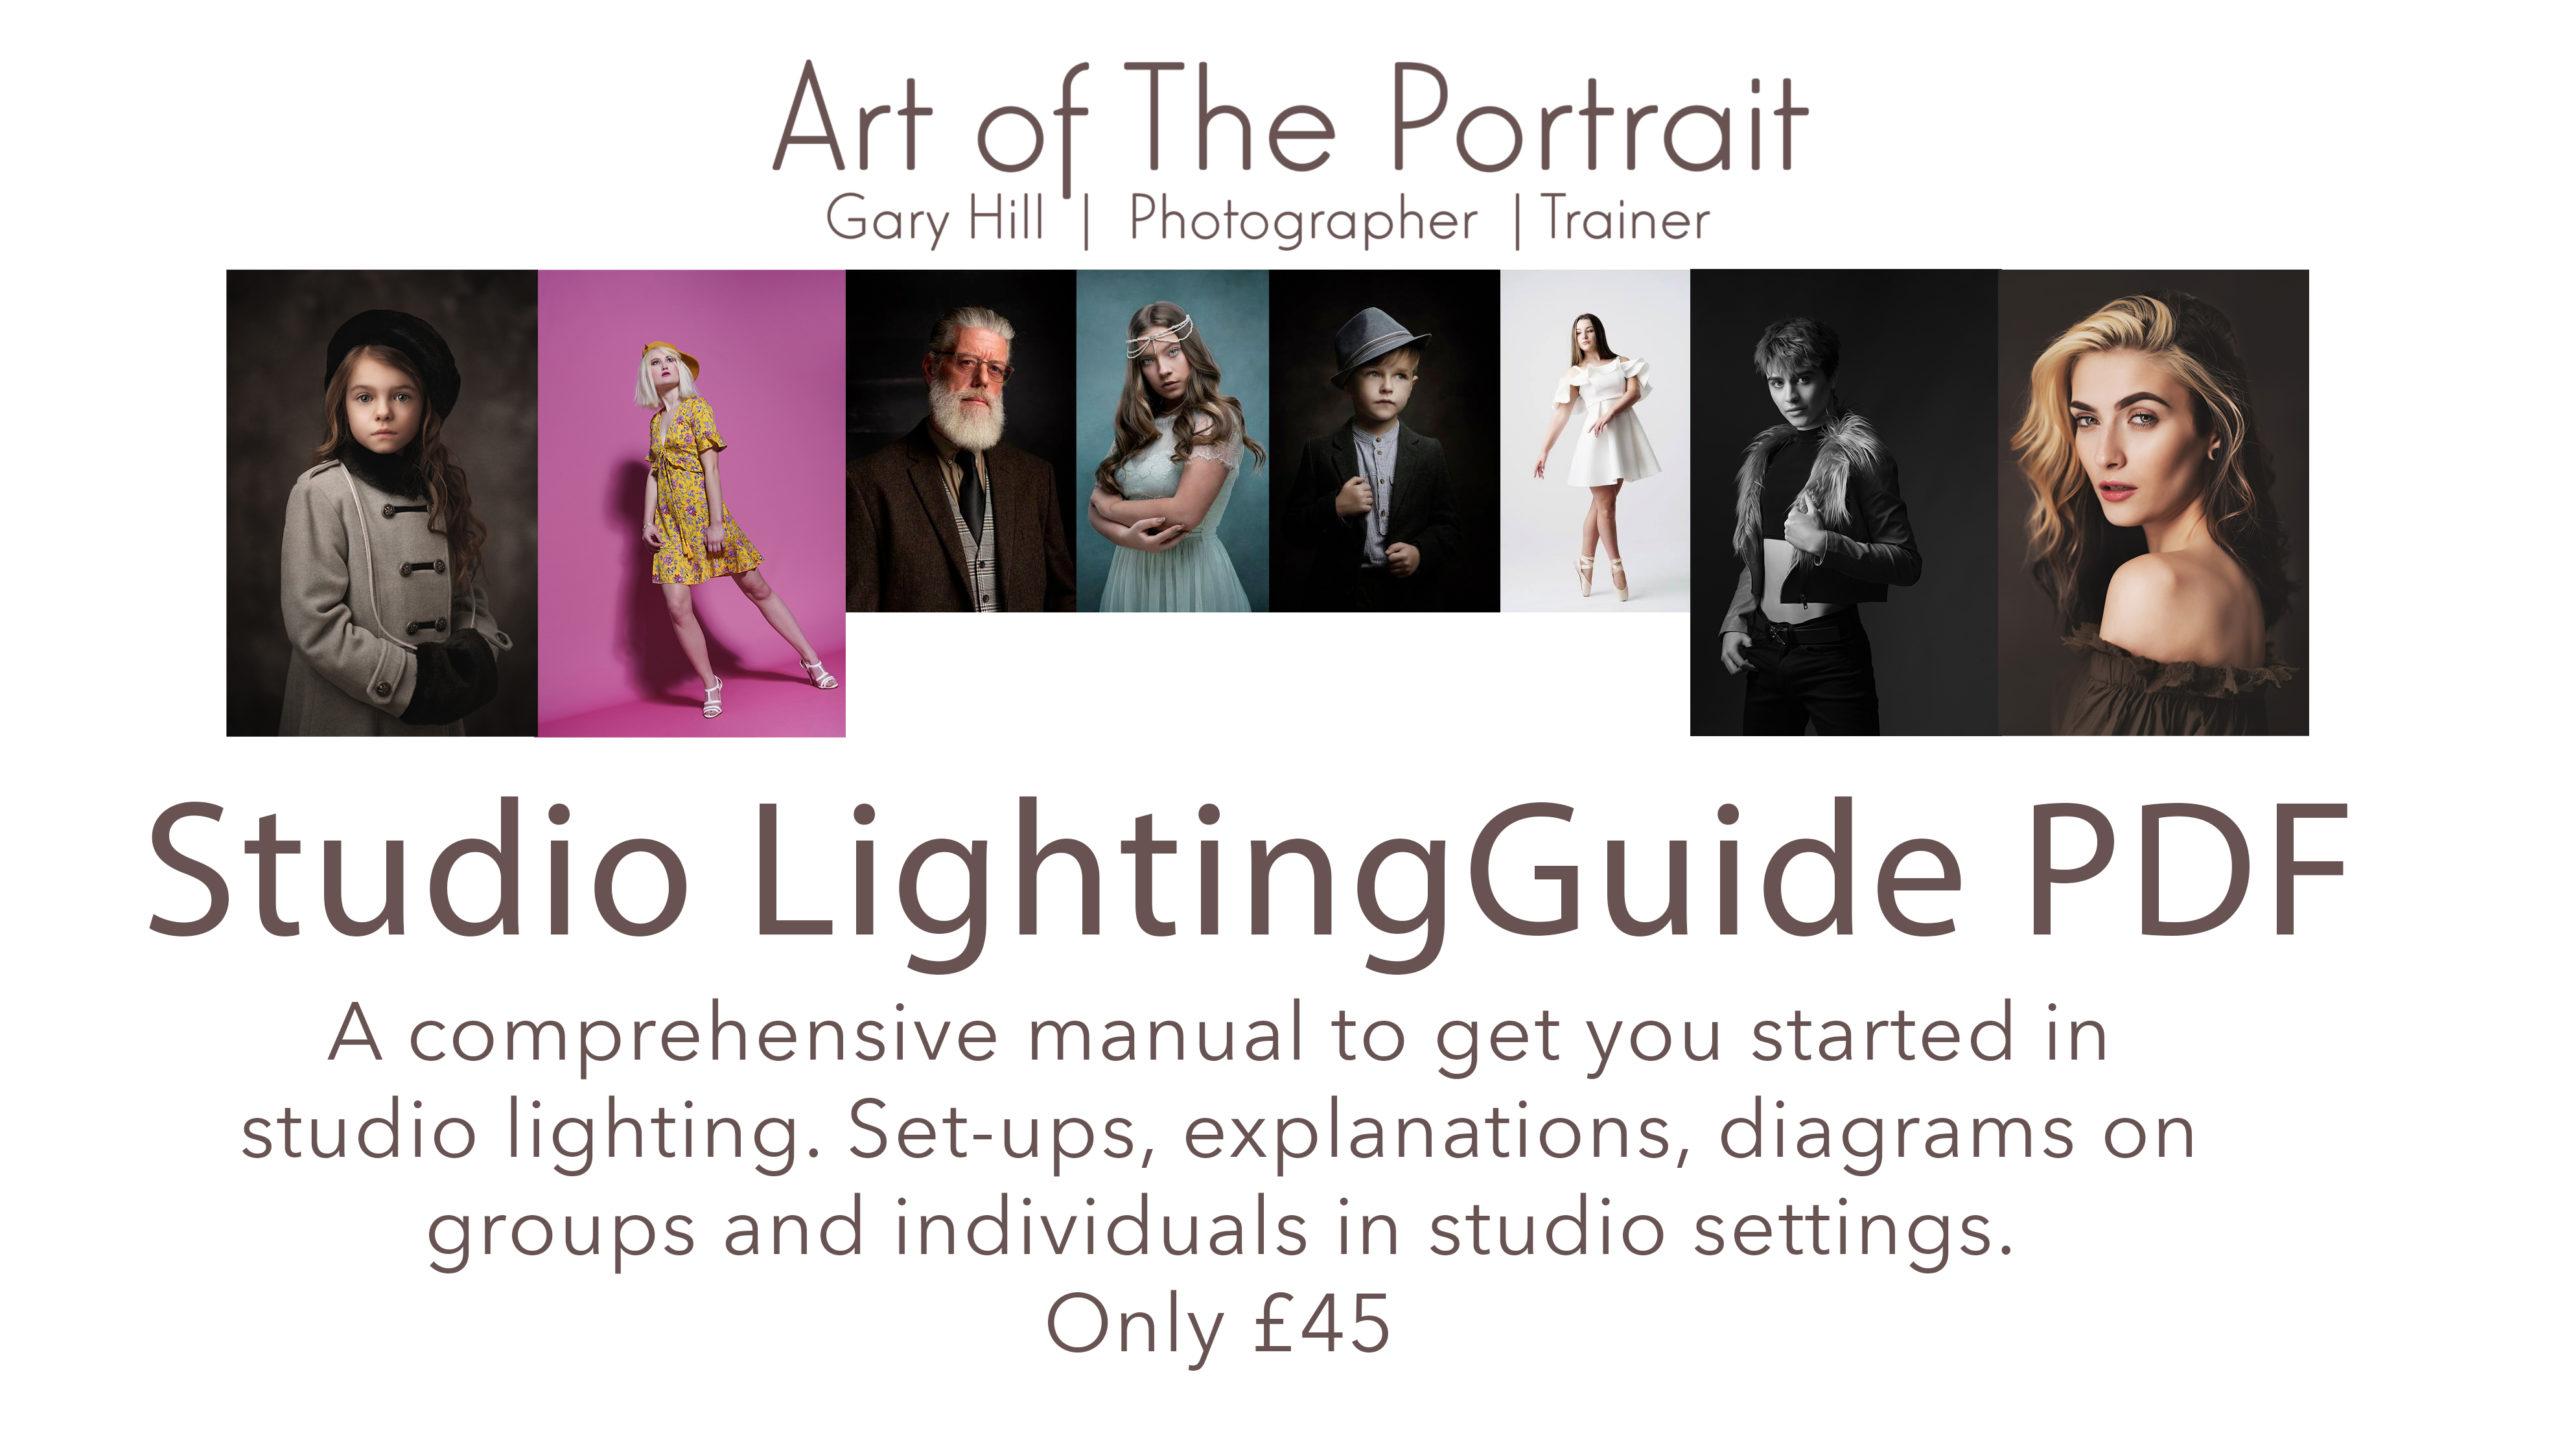 Online photography training - studio lighting guide